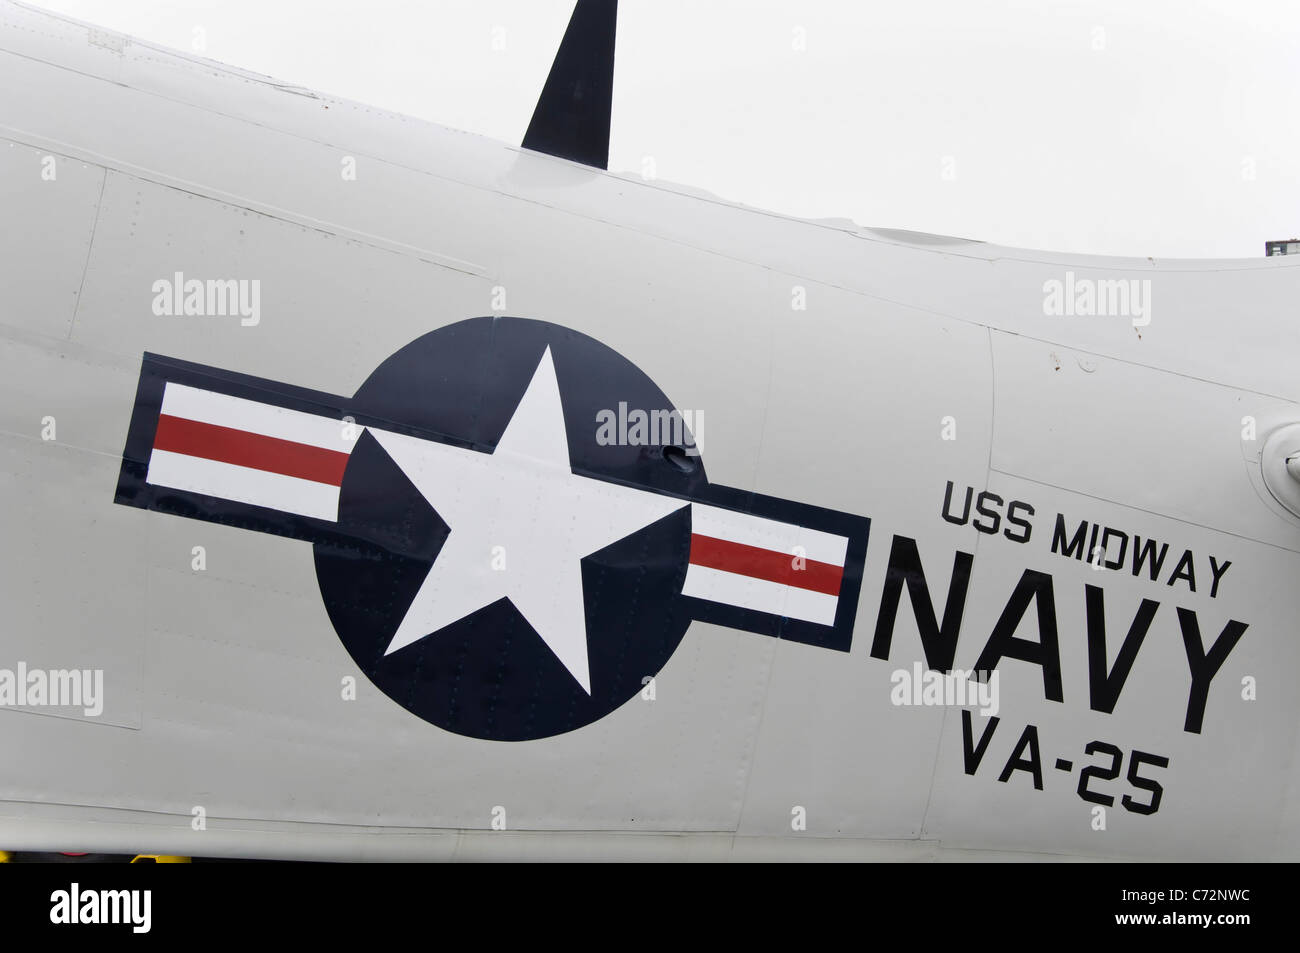 US Navy logo - Stock Image